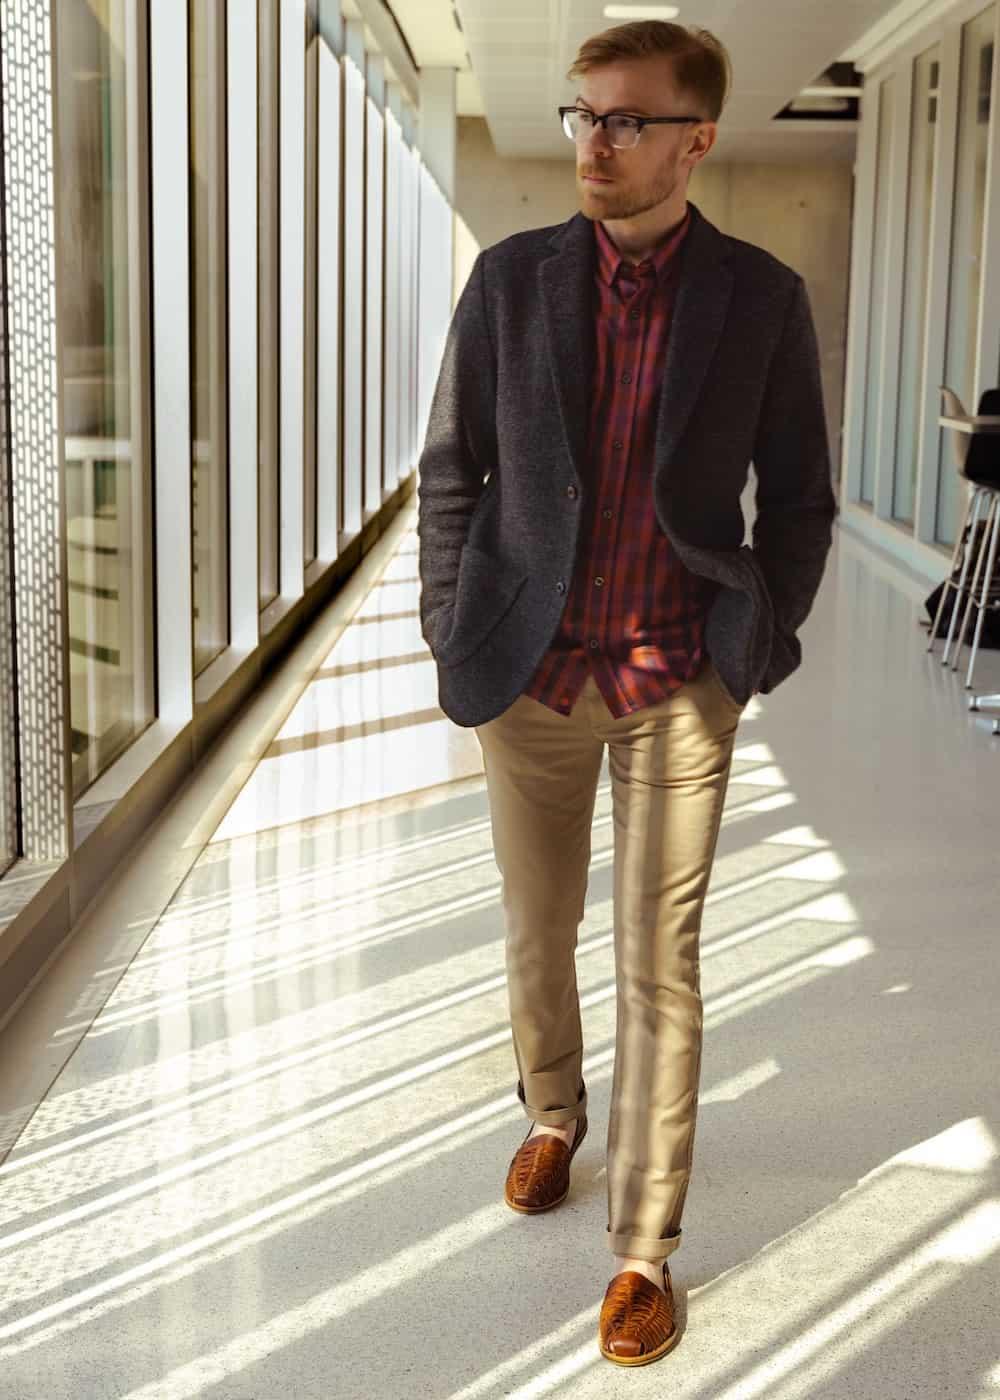 Eco-Stylist founder Garik in Huarache Sandals by Nisolo